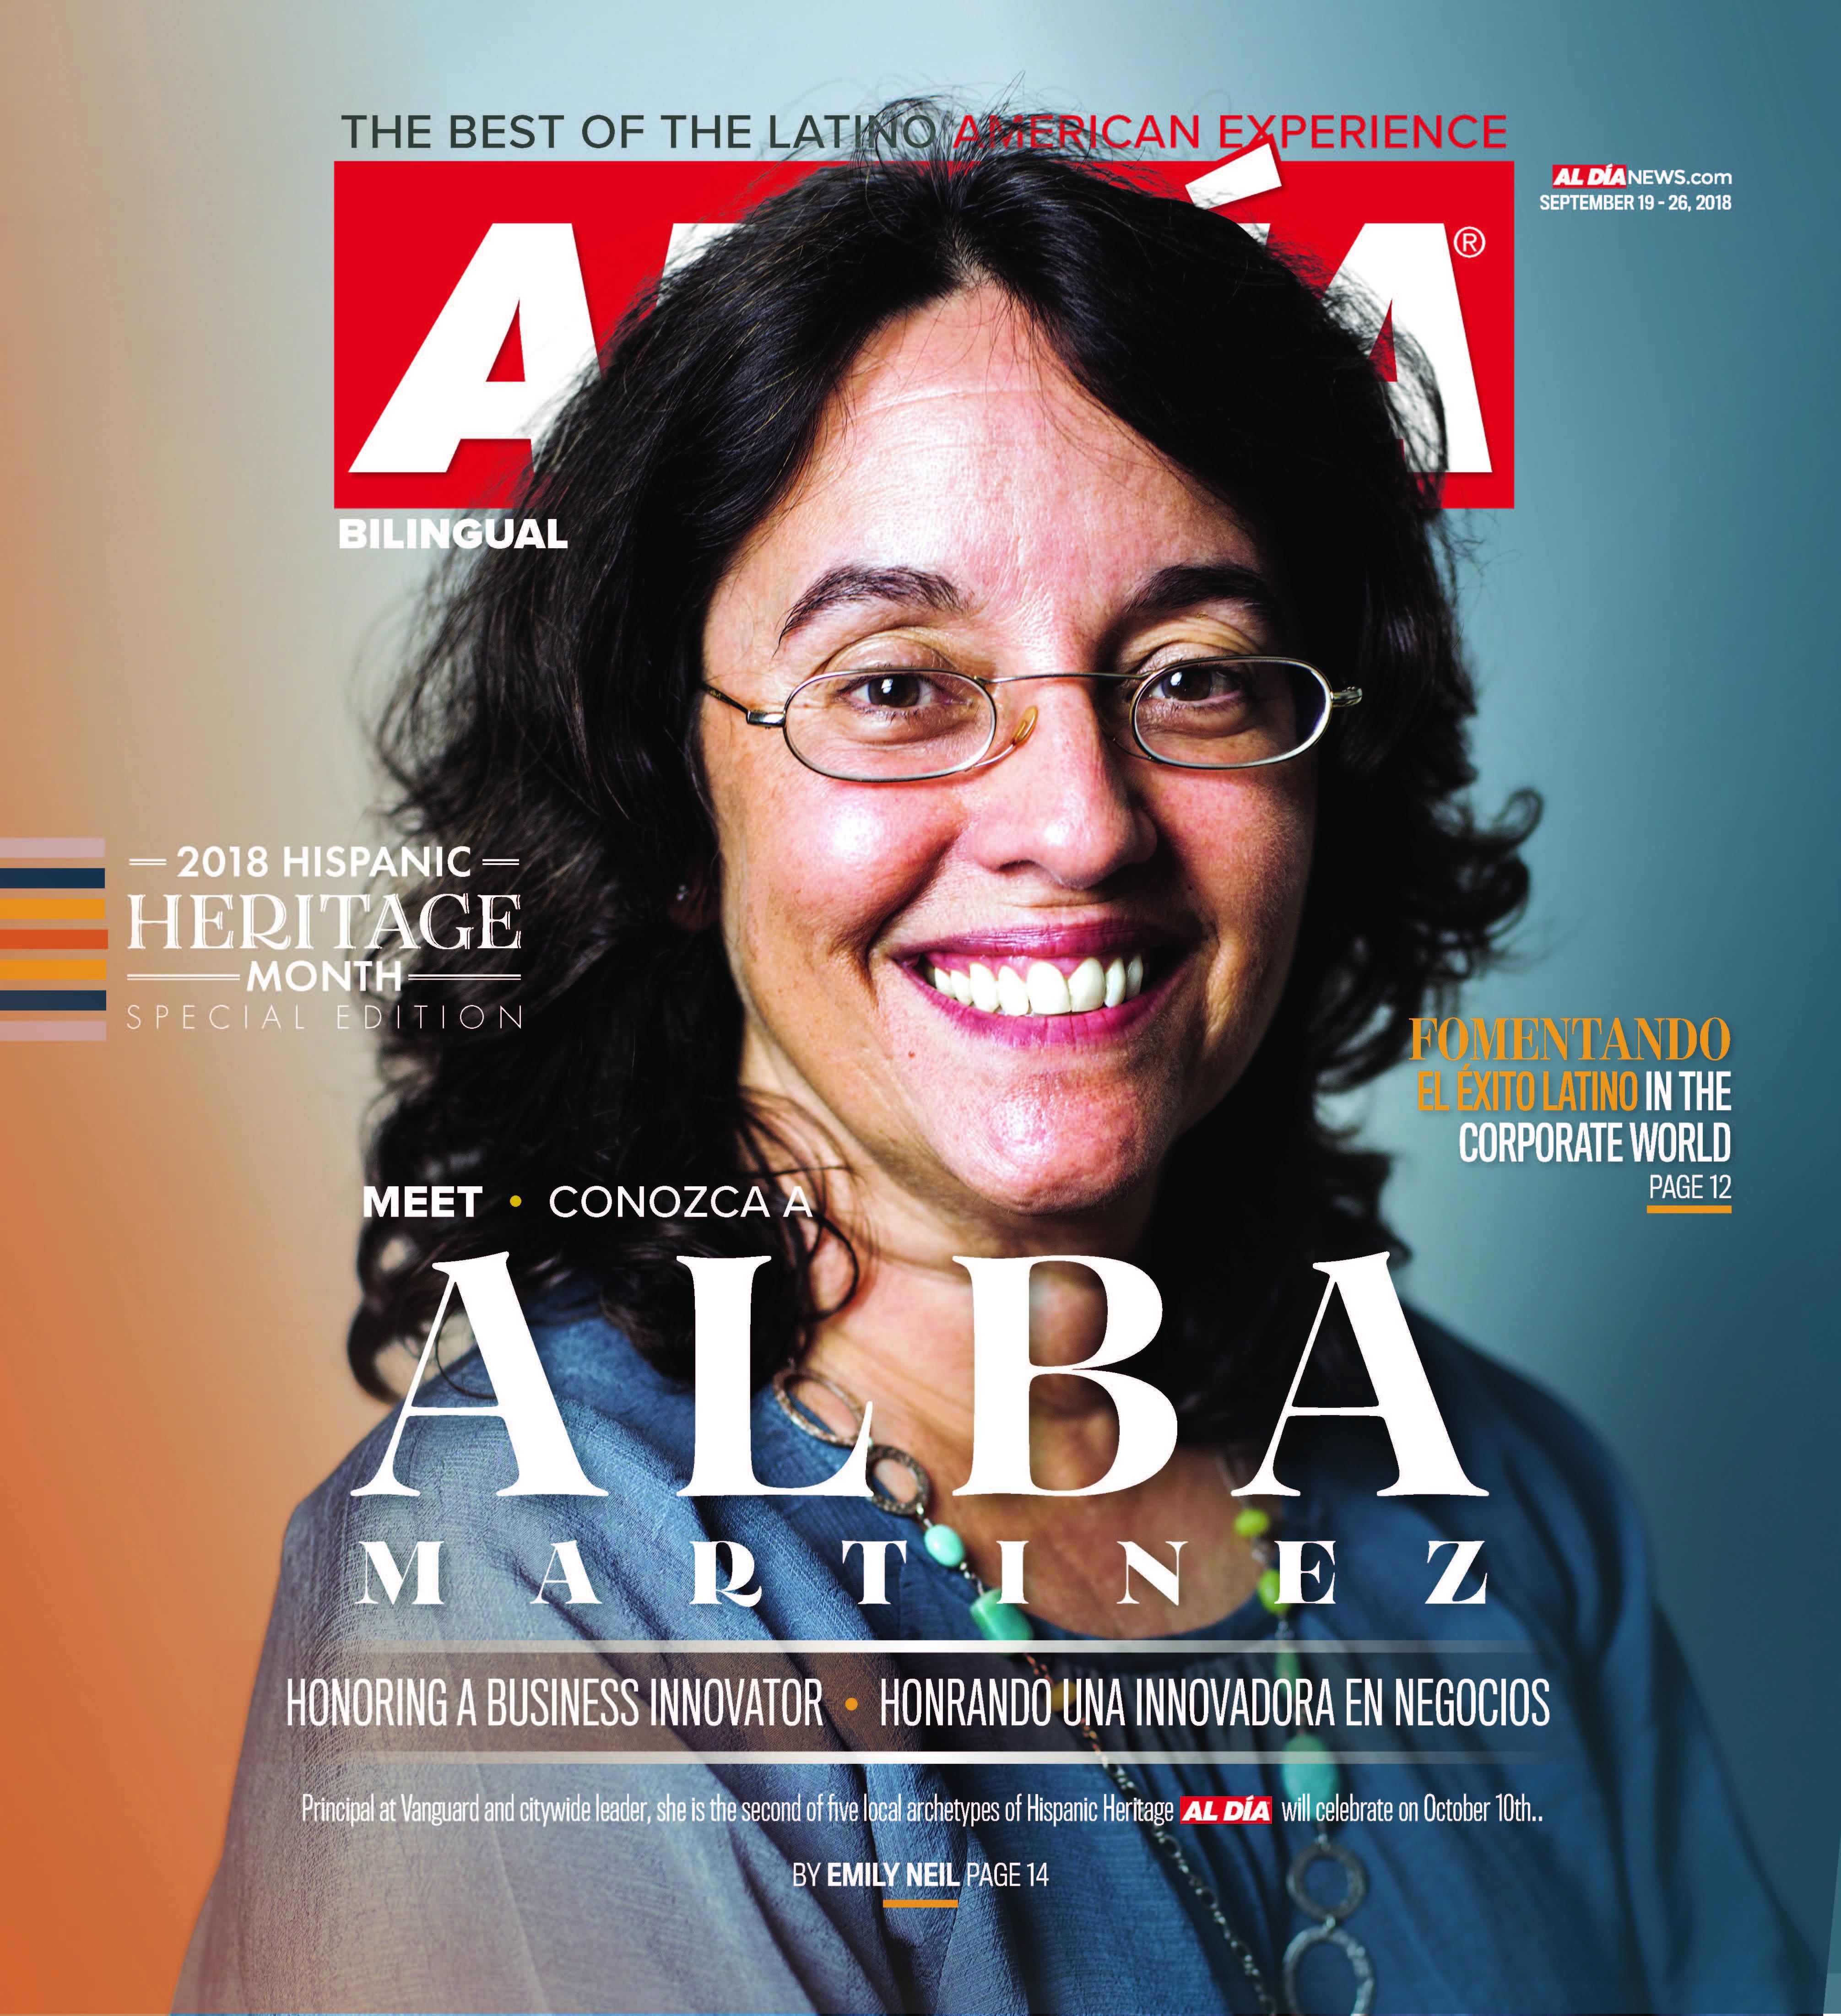 AL DIA News Print Edition September 19 - 26, 2018